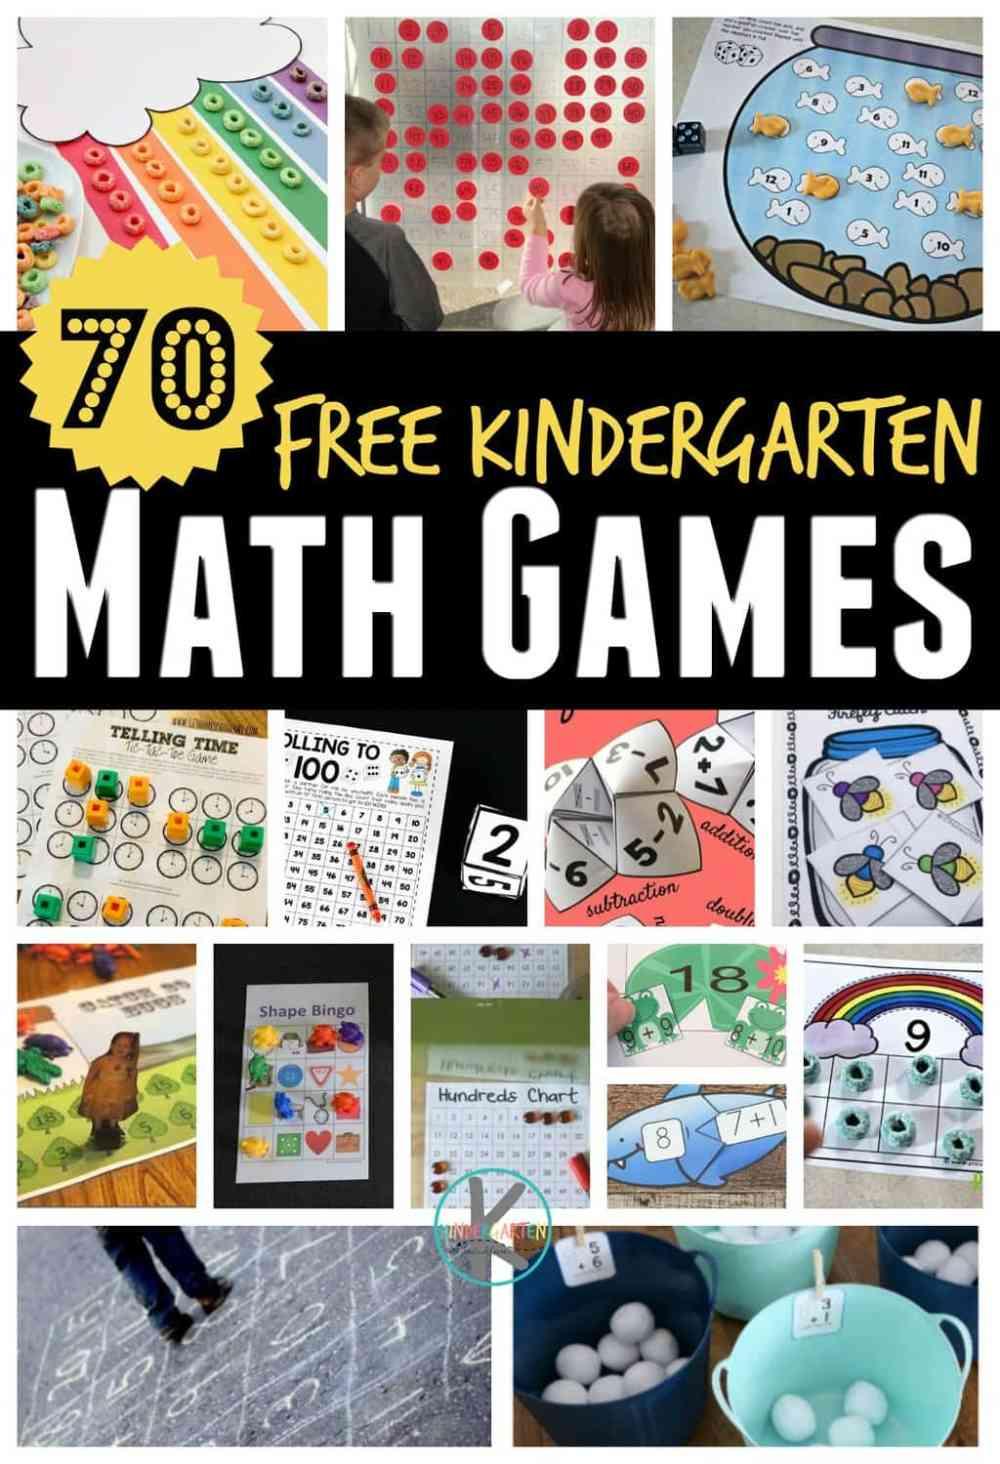 medium resolution of 70 FREE Kindergarten Math Games